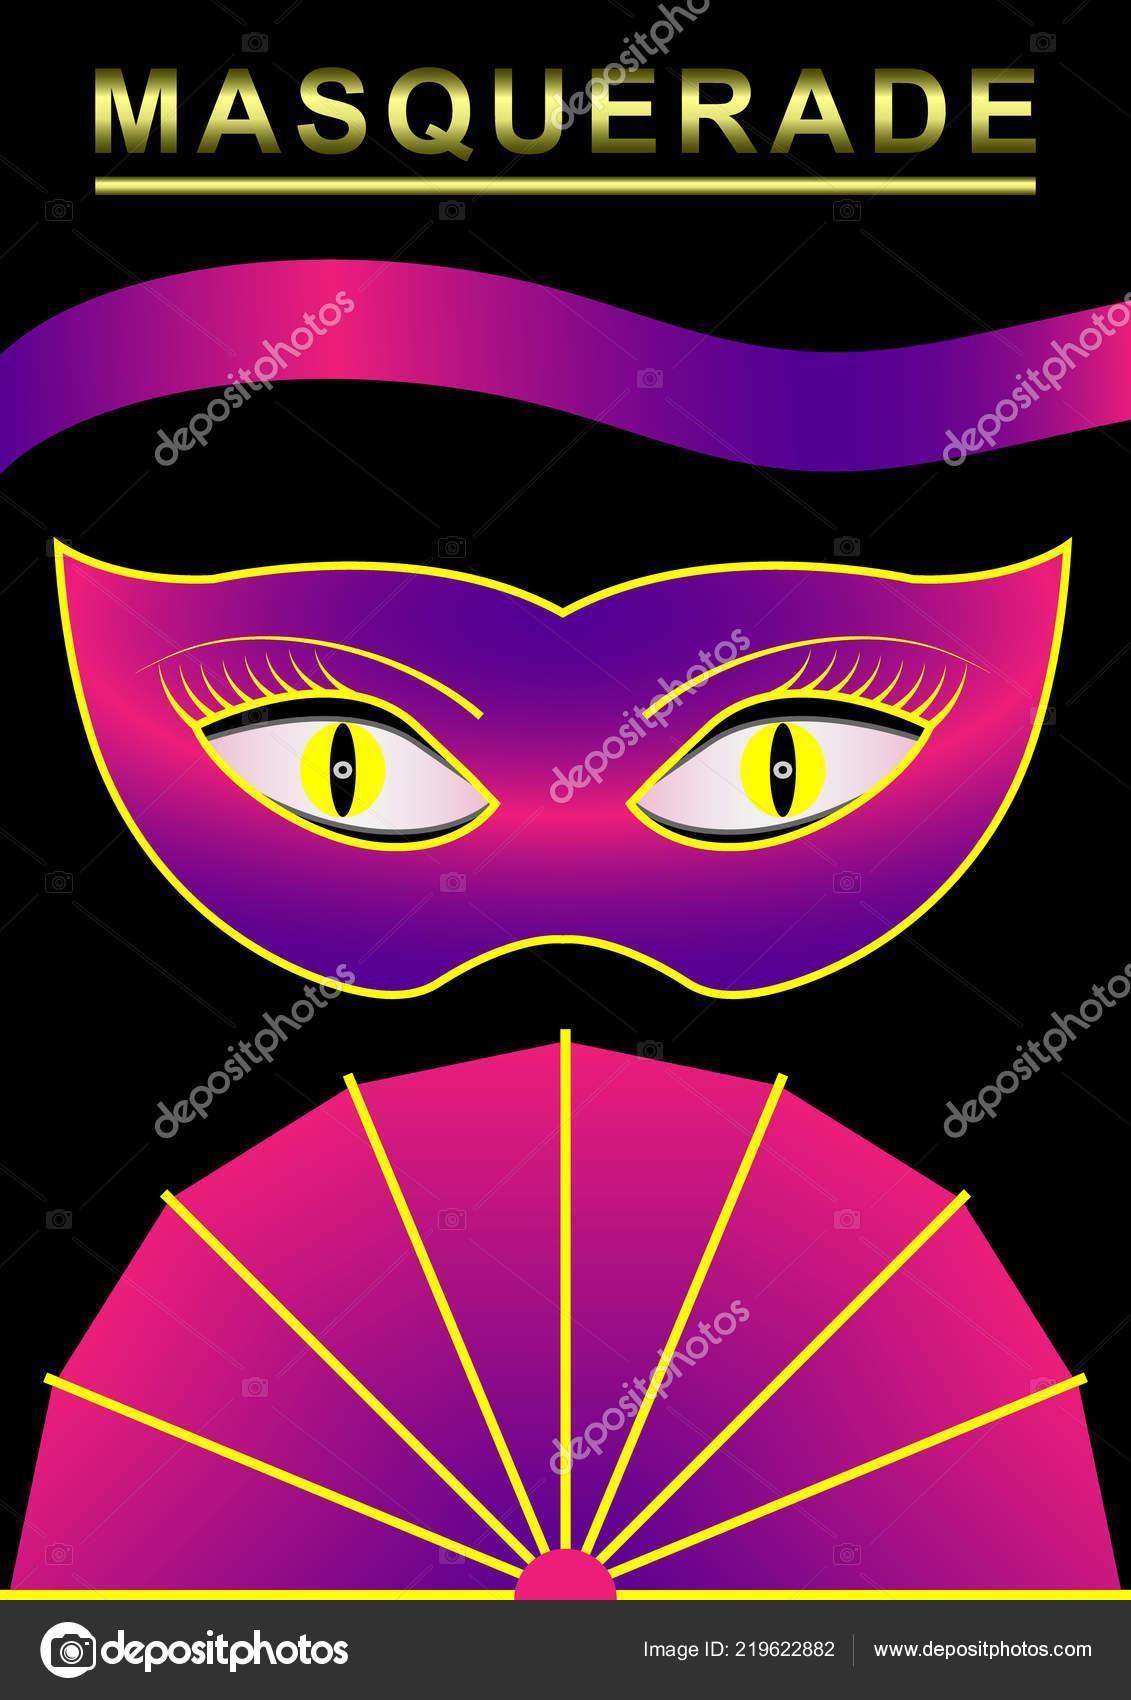 b60ac1797 Masky karneval, maškarní, ventilátor, pásu karet, plakát. Vektorové  ilustrace — Vektor od ...